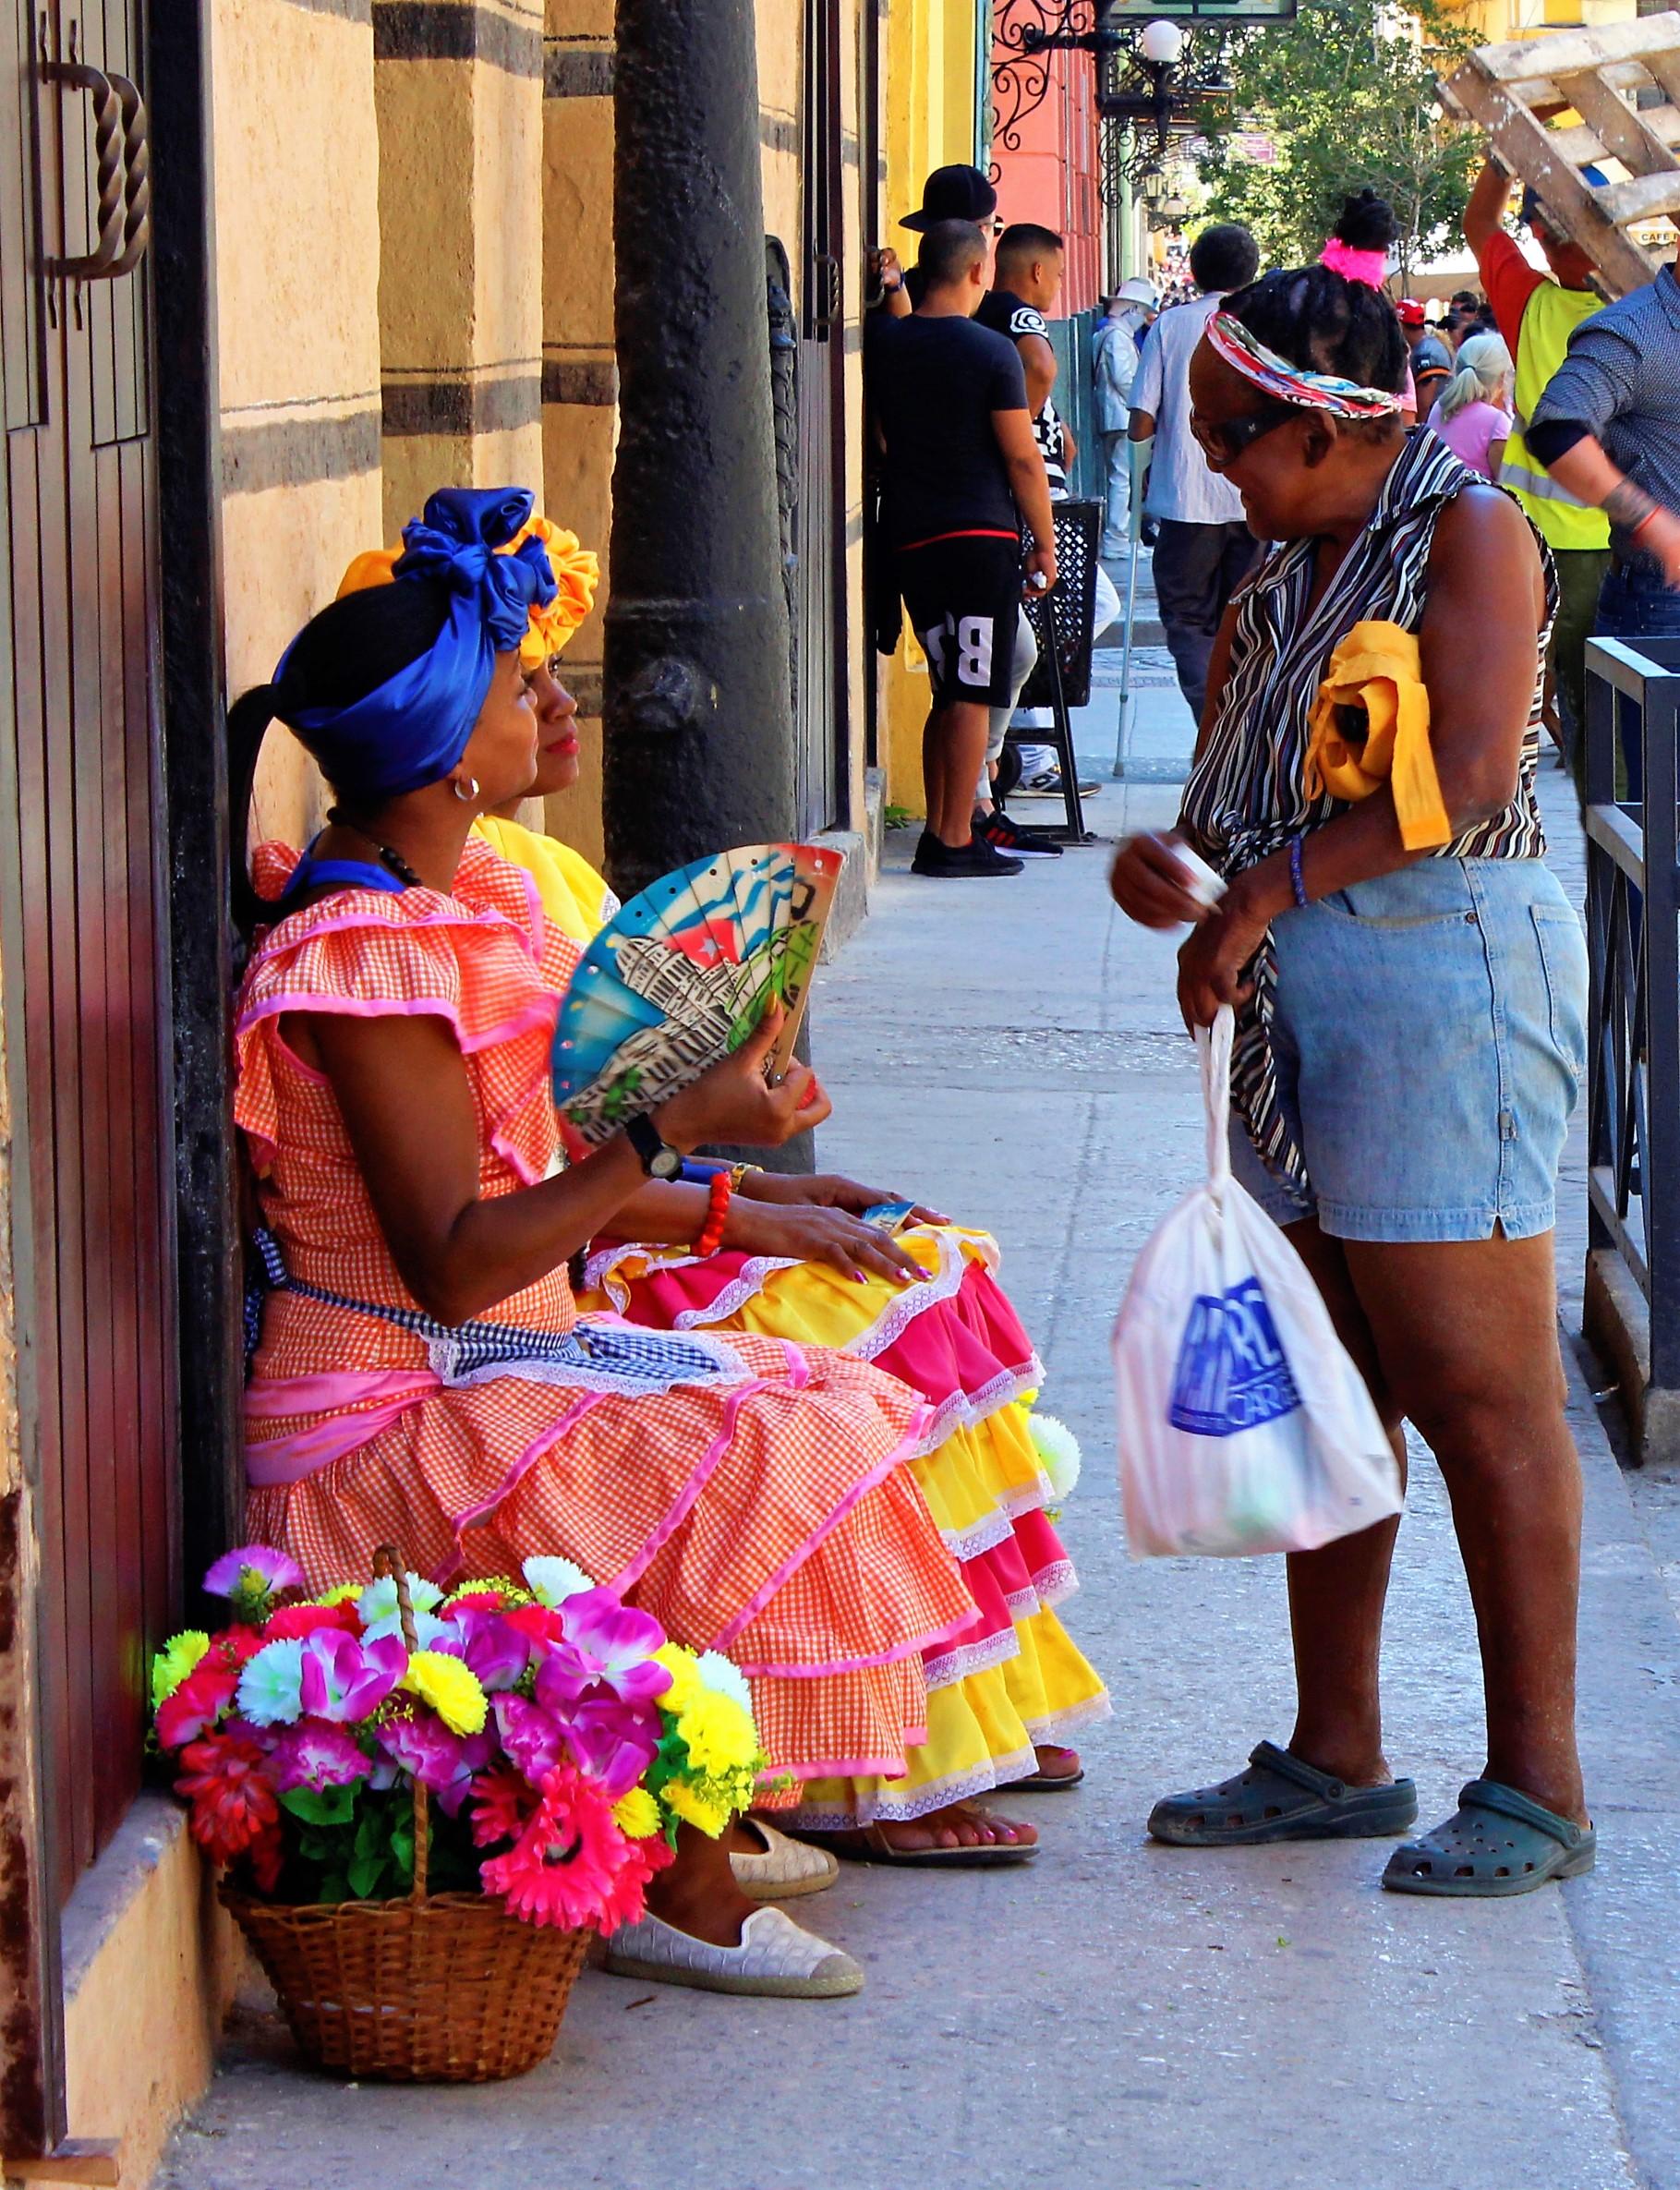 Havana. (Credits: Viola Bellisai)